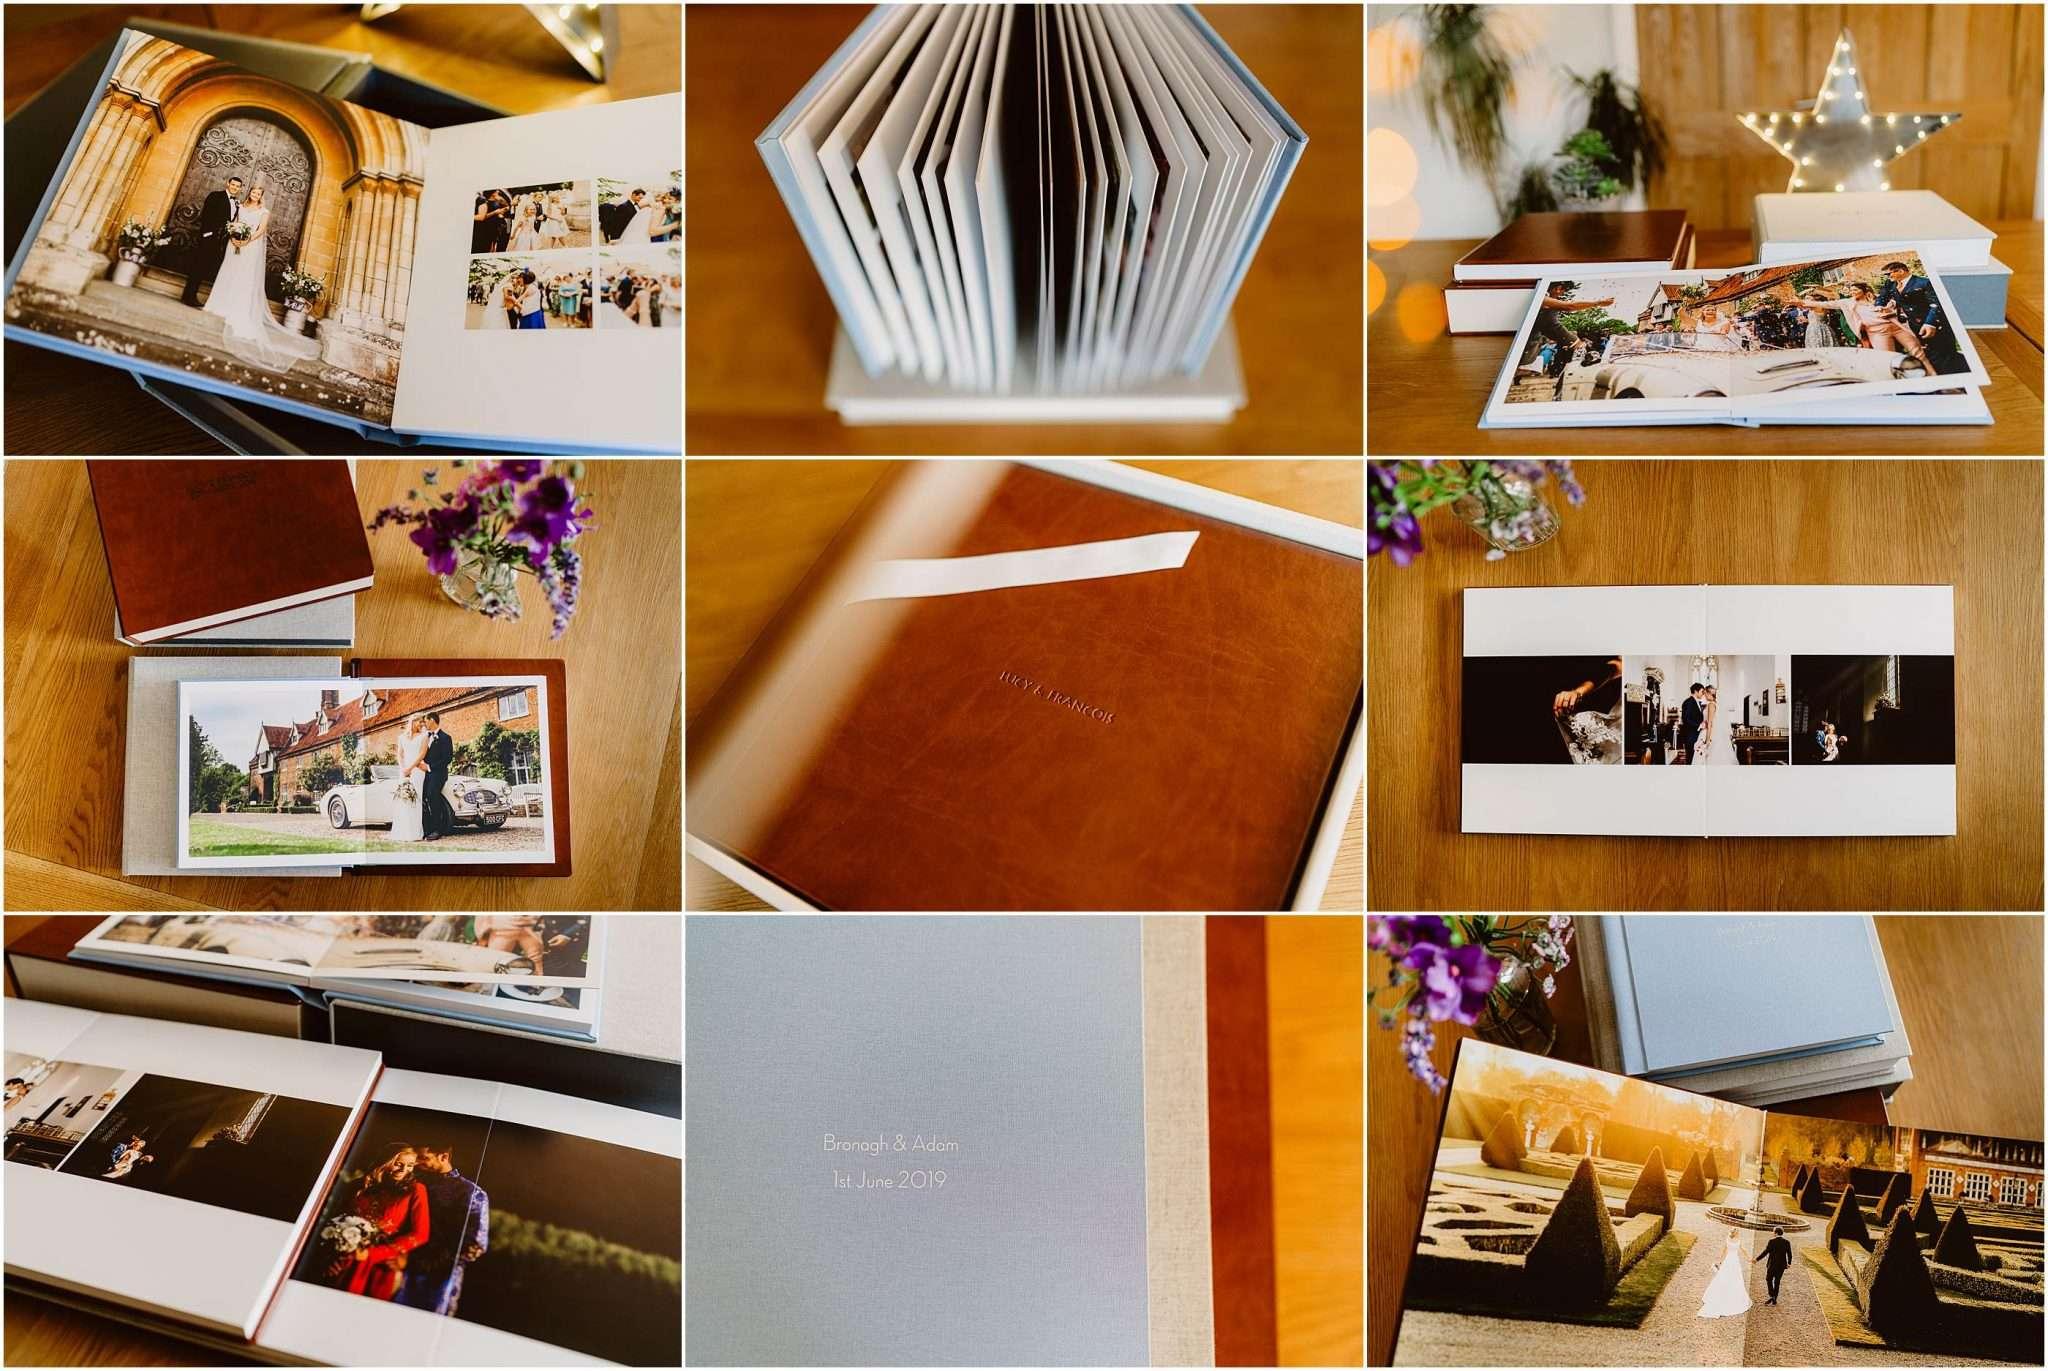 Norfolk Wedding Photographer Wedding Albums